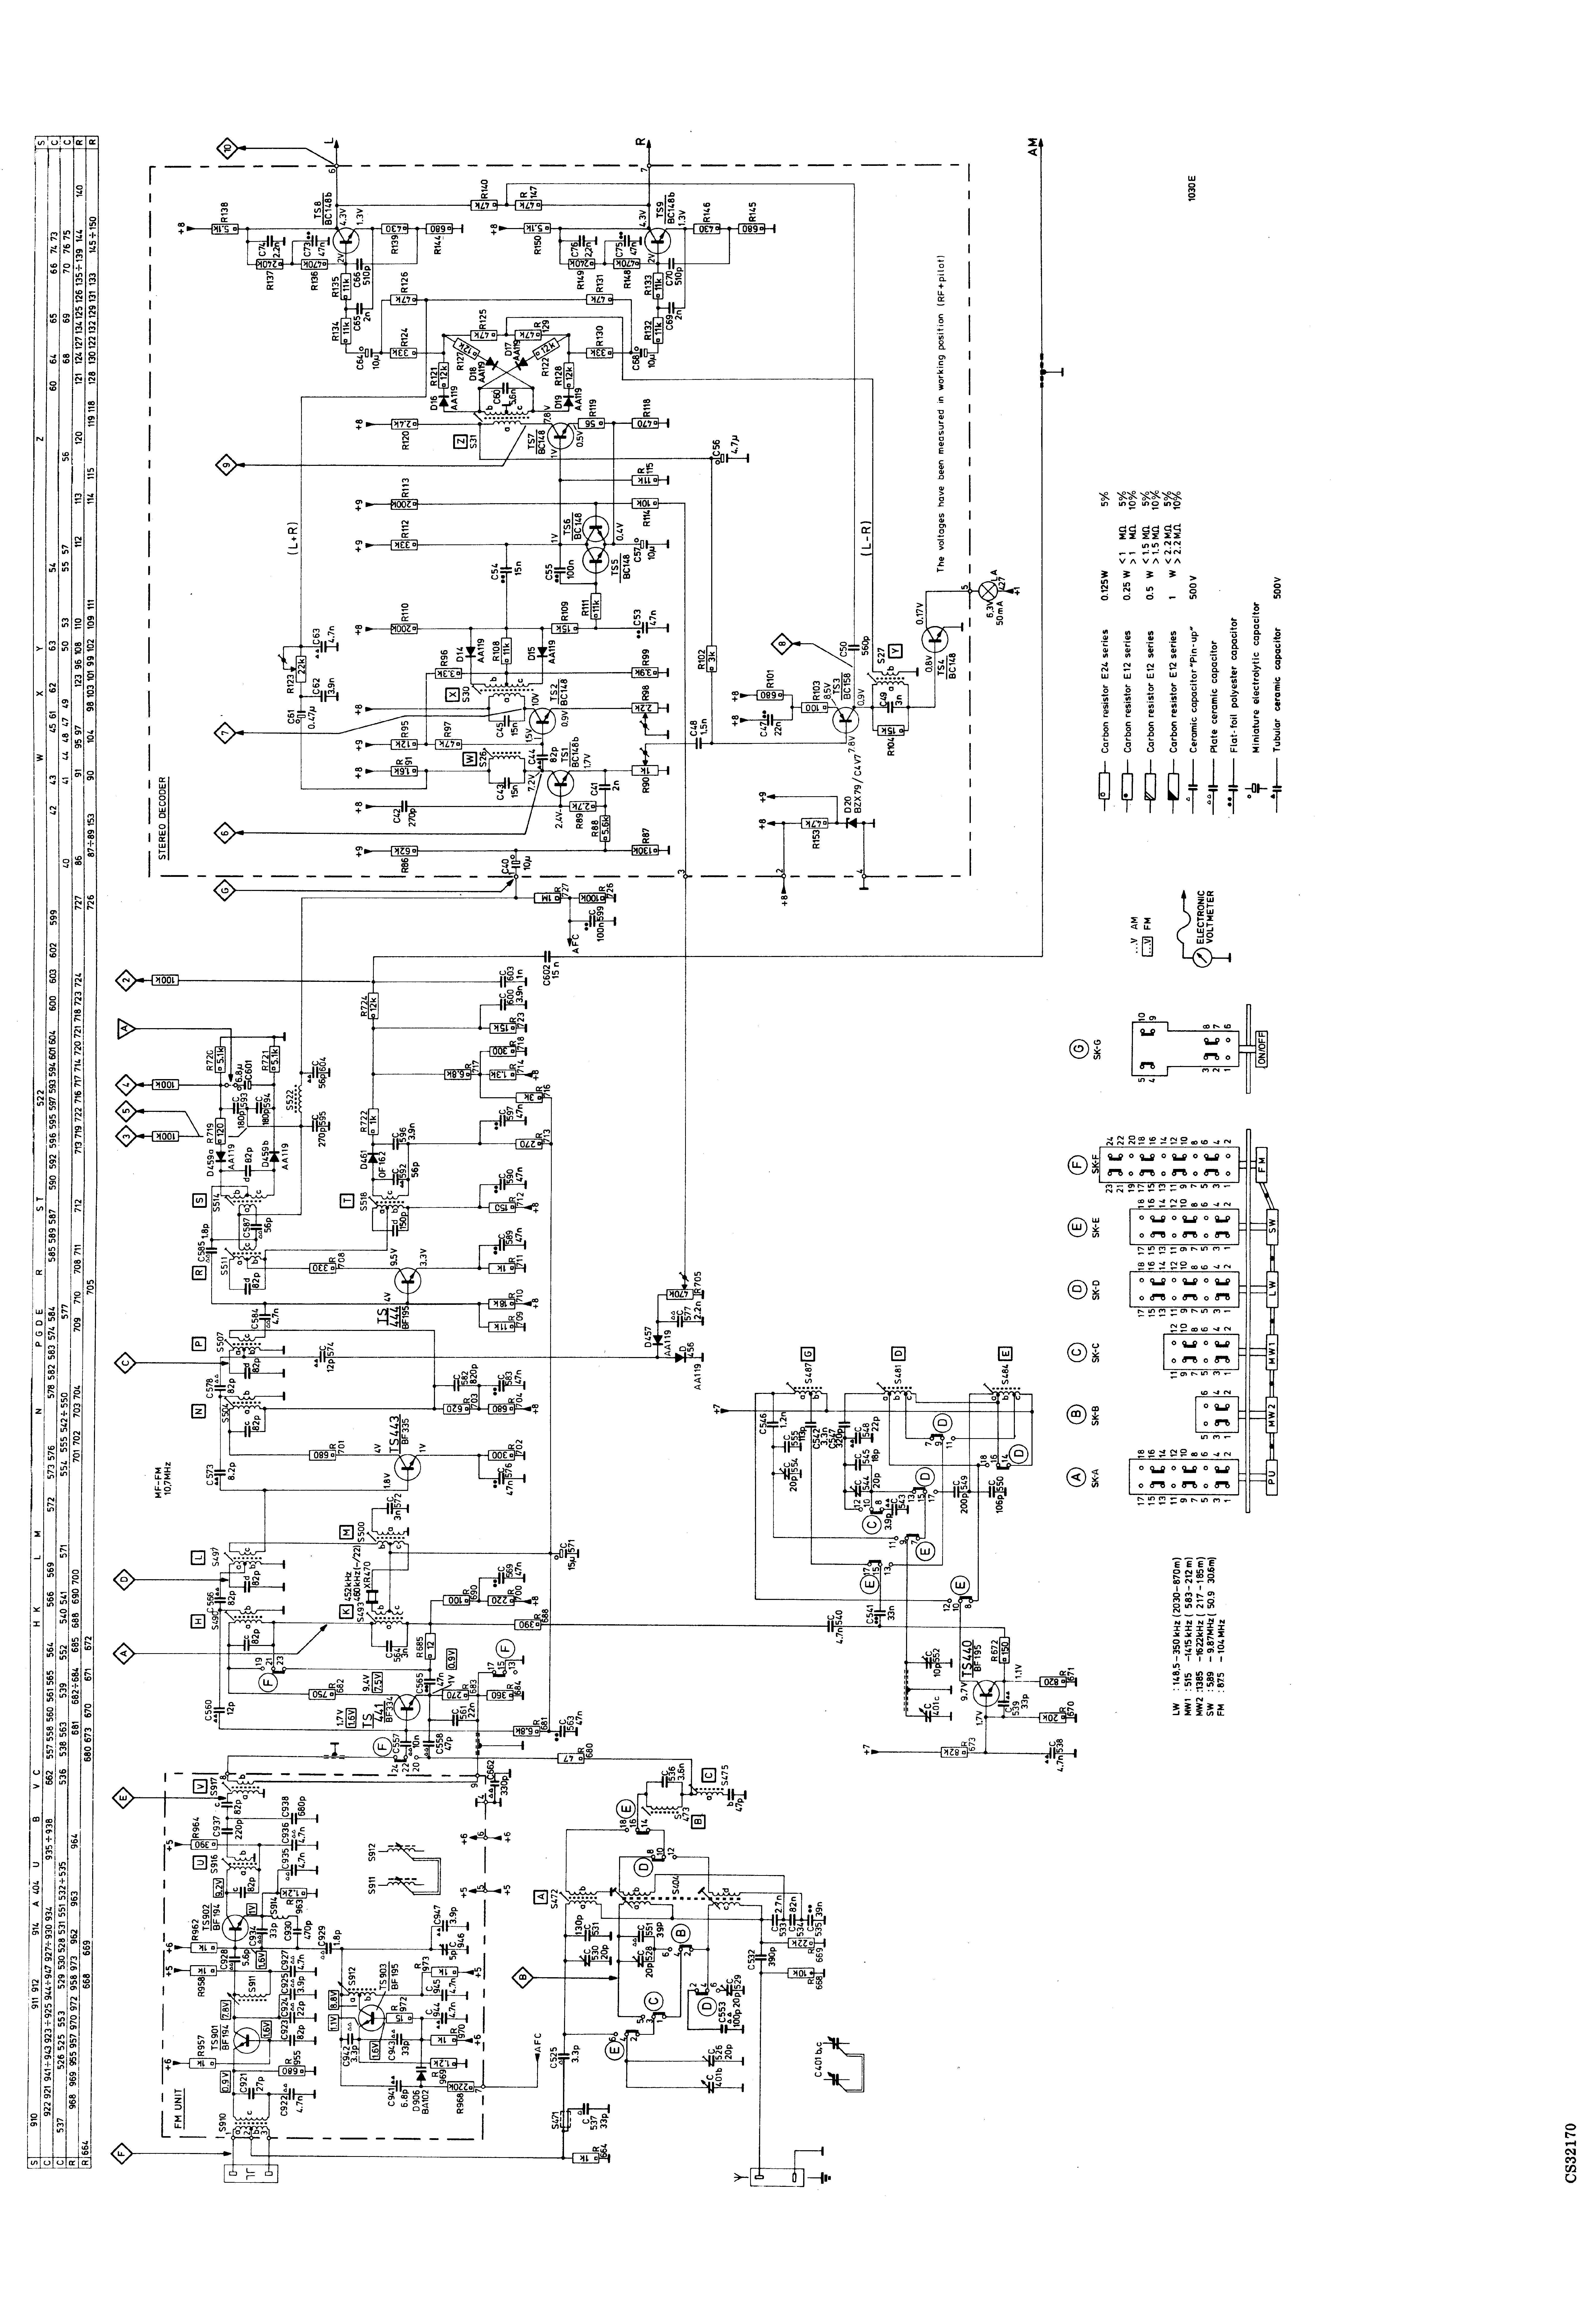 PHILIPS RADIO 22RH814 SM Service Manual download